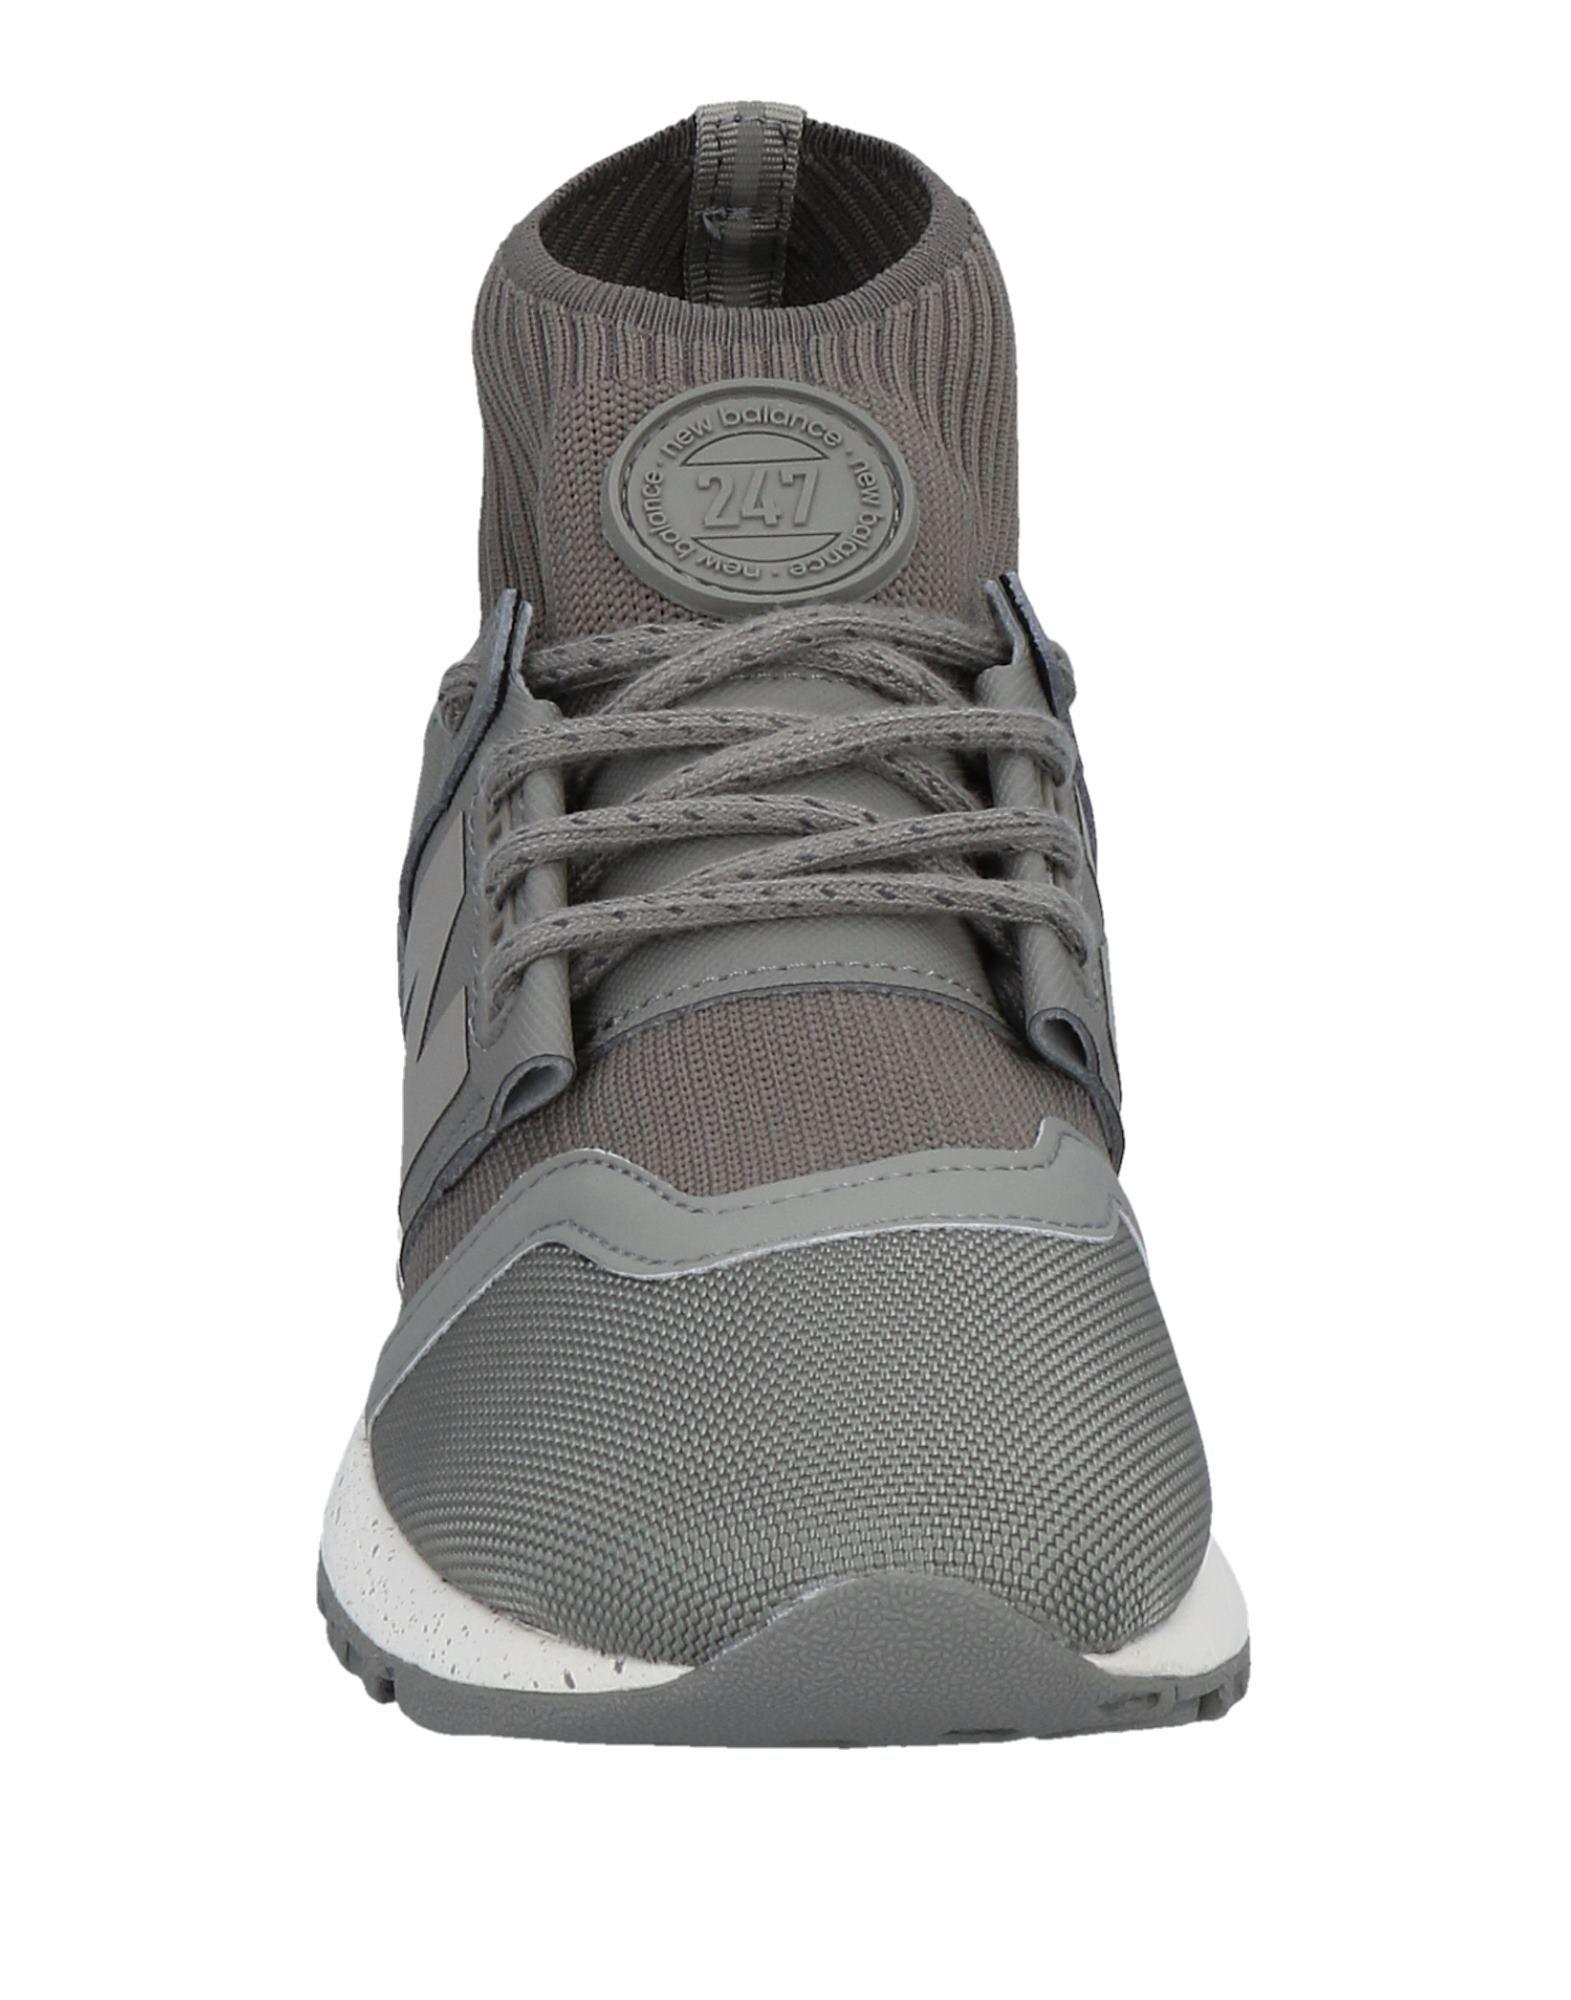 New Balance Sneakers Sneakers Sneakers Damen  11503402KQ Gute Qualität beliebte Schuhe 188b90